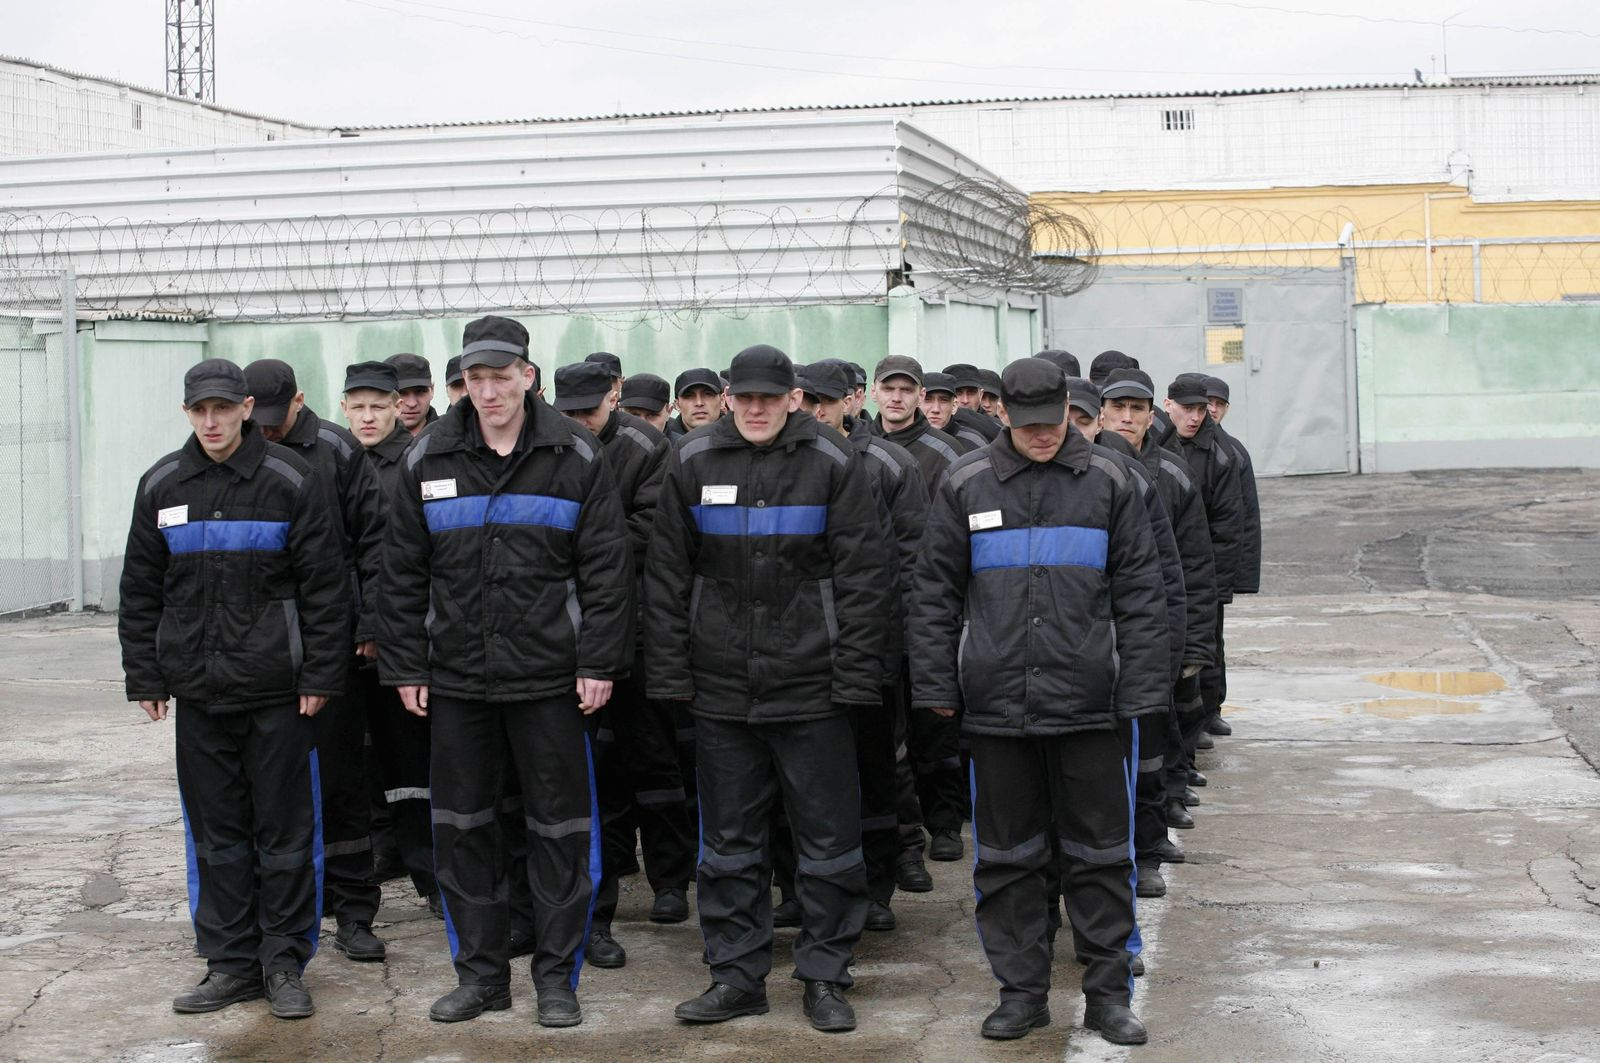 Russland/ Gefängnis